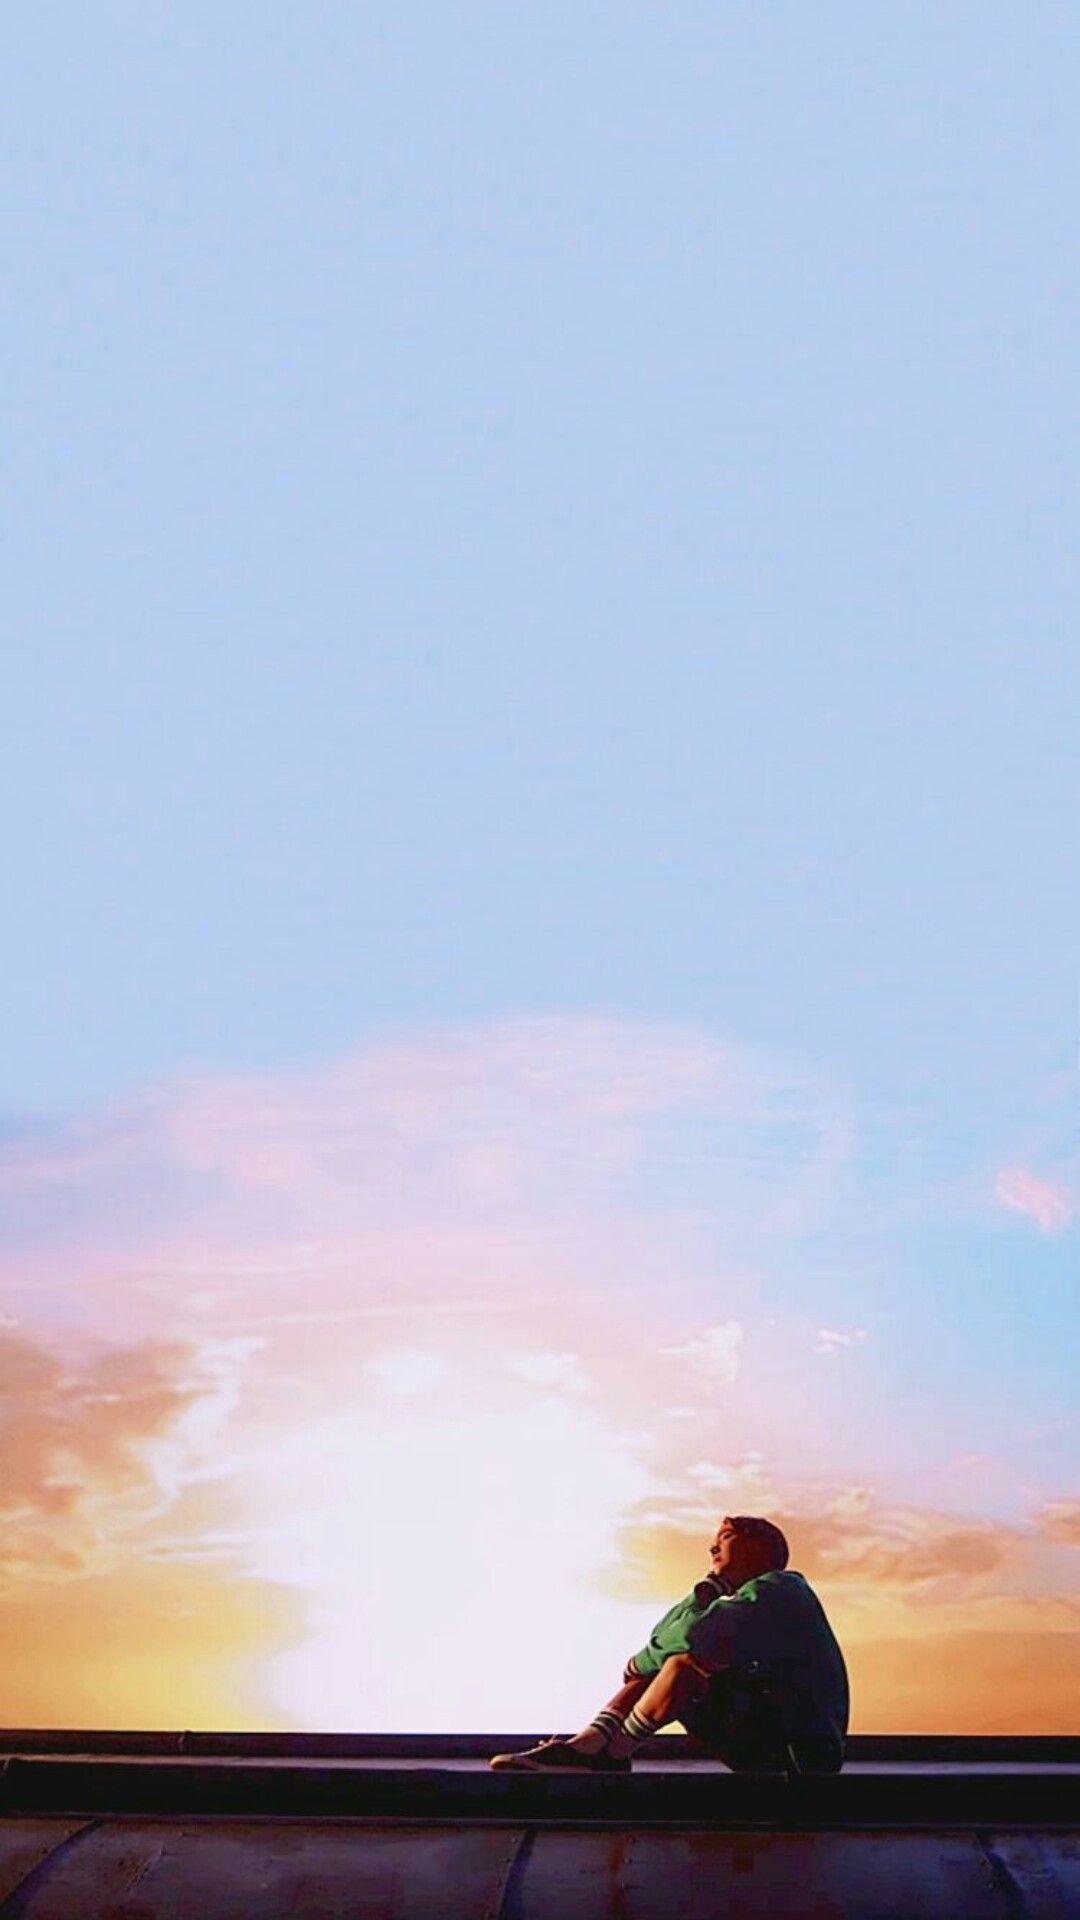 1080x1920 Bts Spring Day Teaser Wallpaper Bts Spring Day Wallpaper Bts Bts Spring Day Bts Spring Day Wallpaper Bts Wings Wallpaper